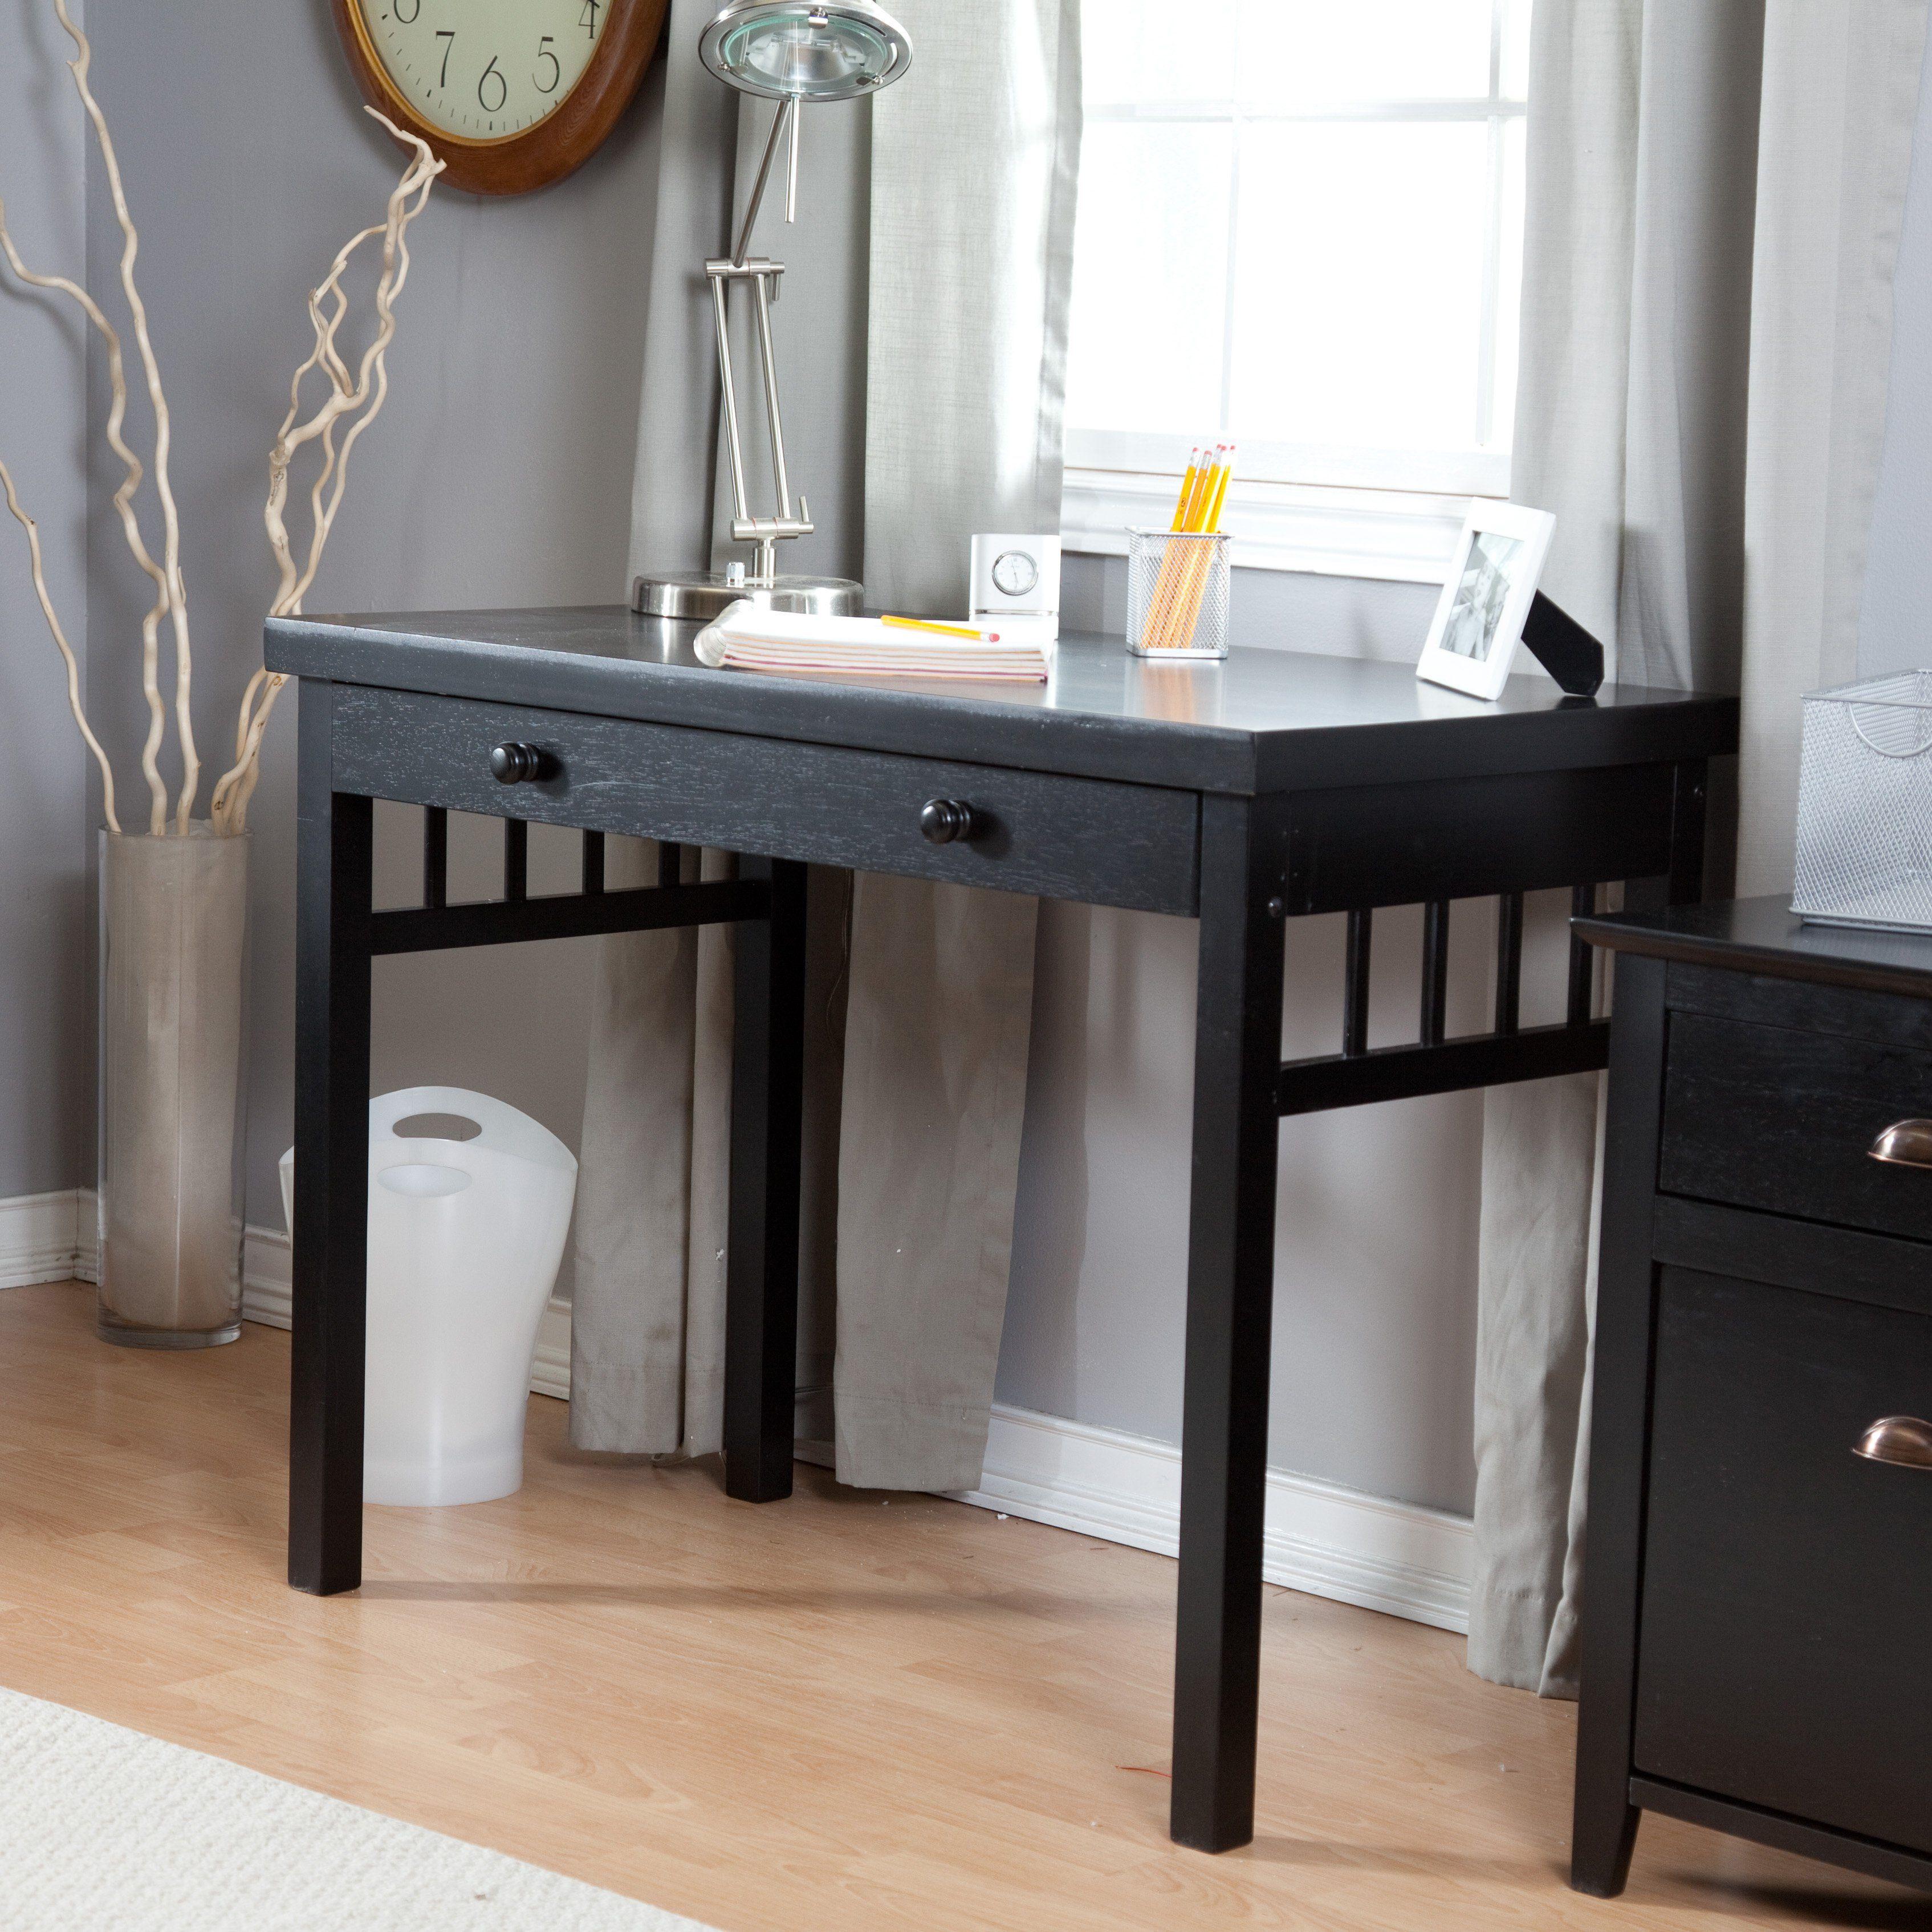 Small Mission Writing Desk Black Black Desk Home Office Furniture Black Writing Desk